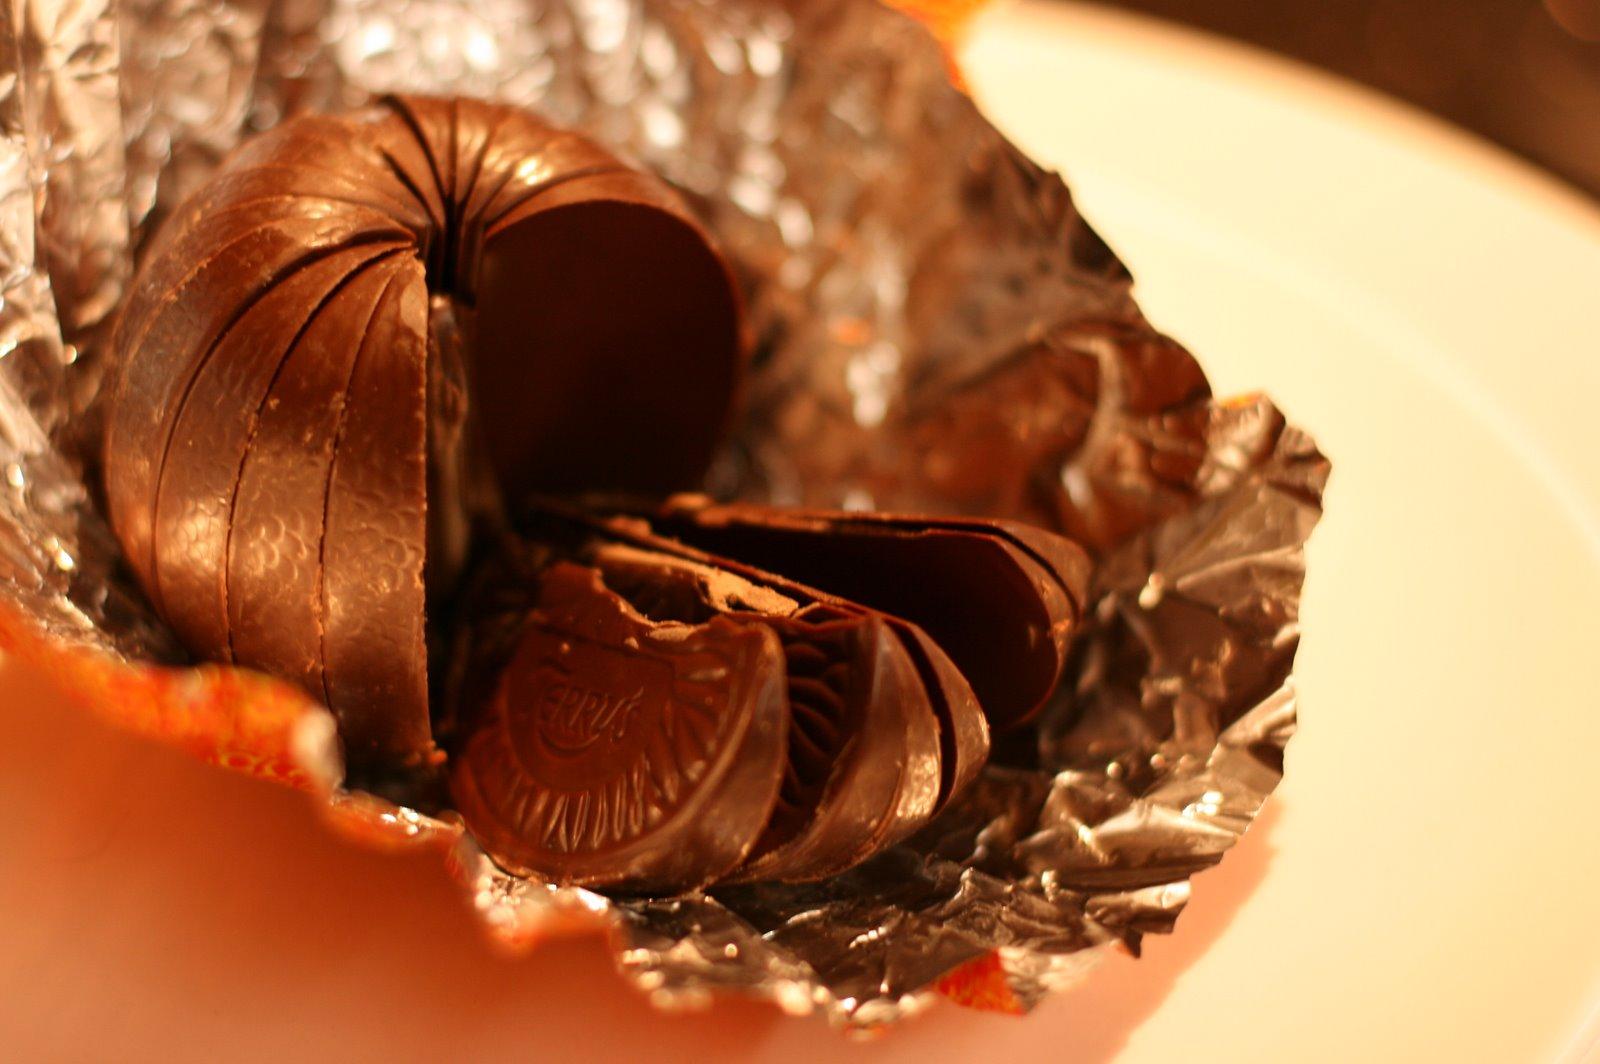 Yummy chocolates